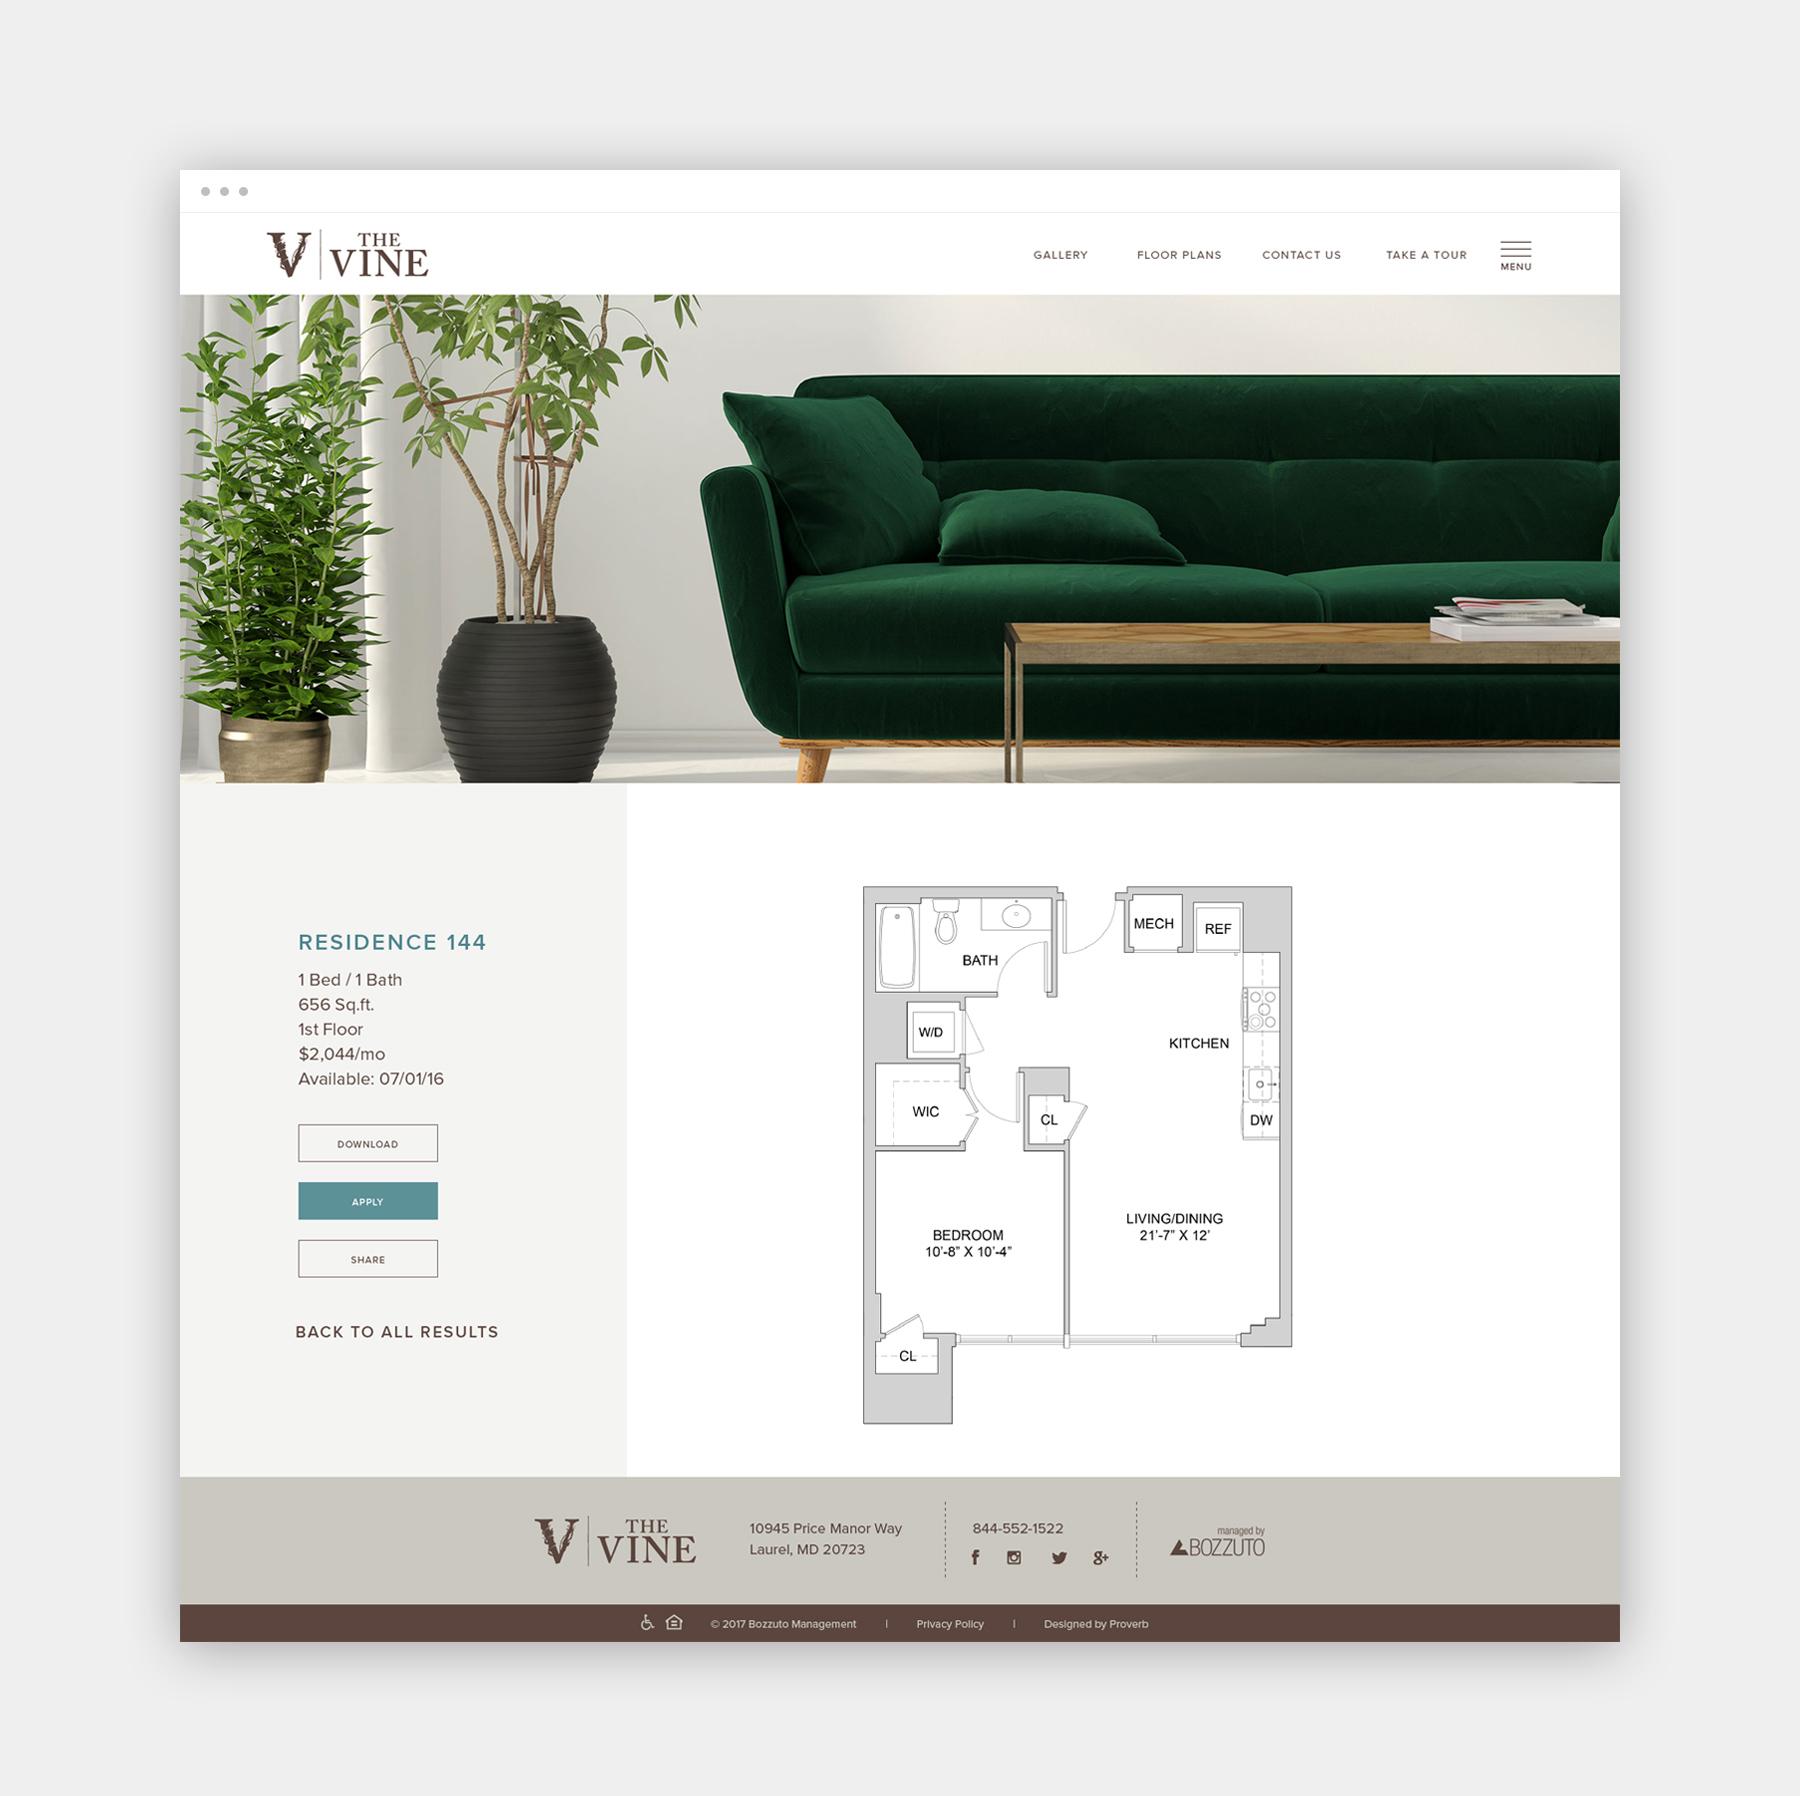 TheVine_floorplans_individual_result.jpg